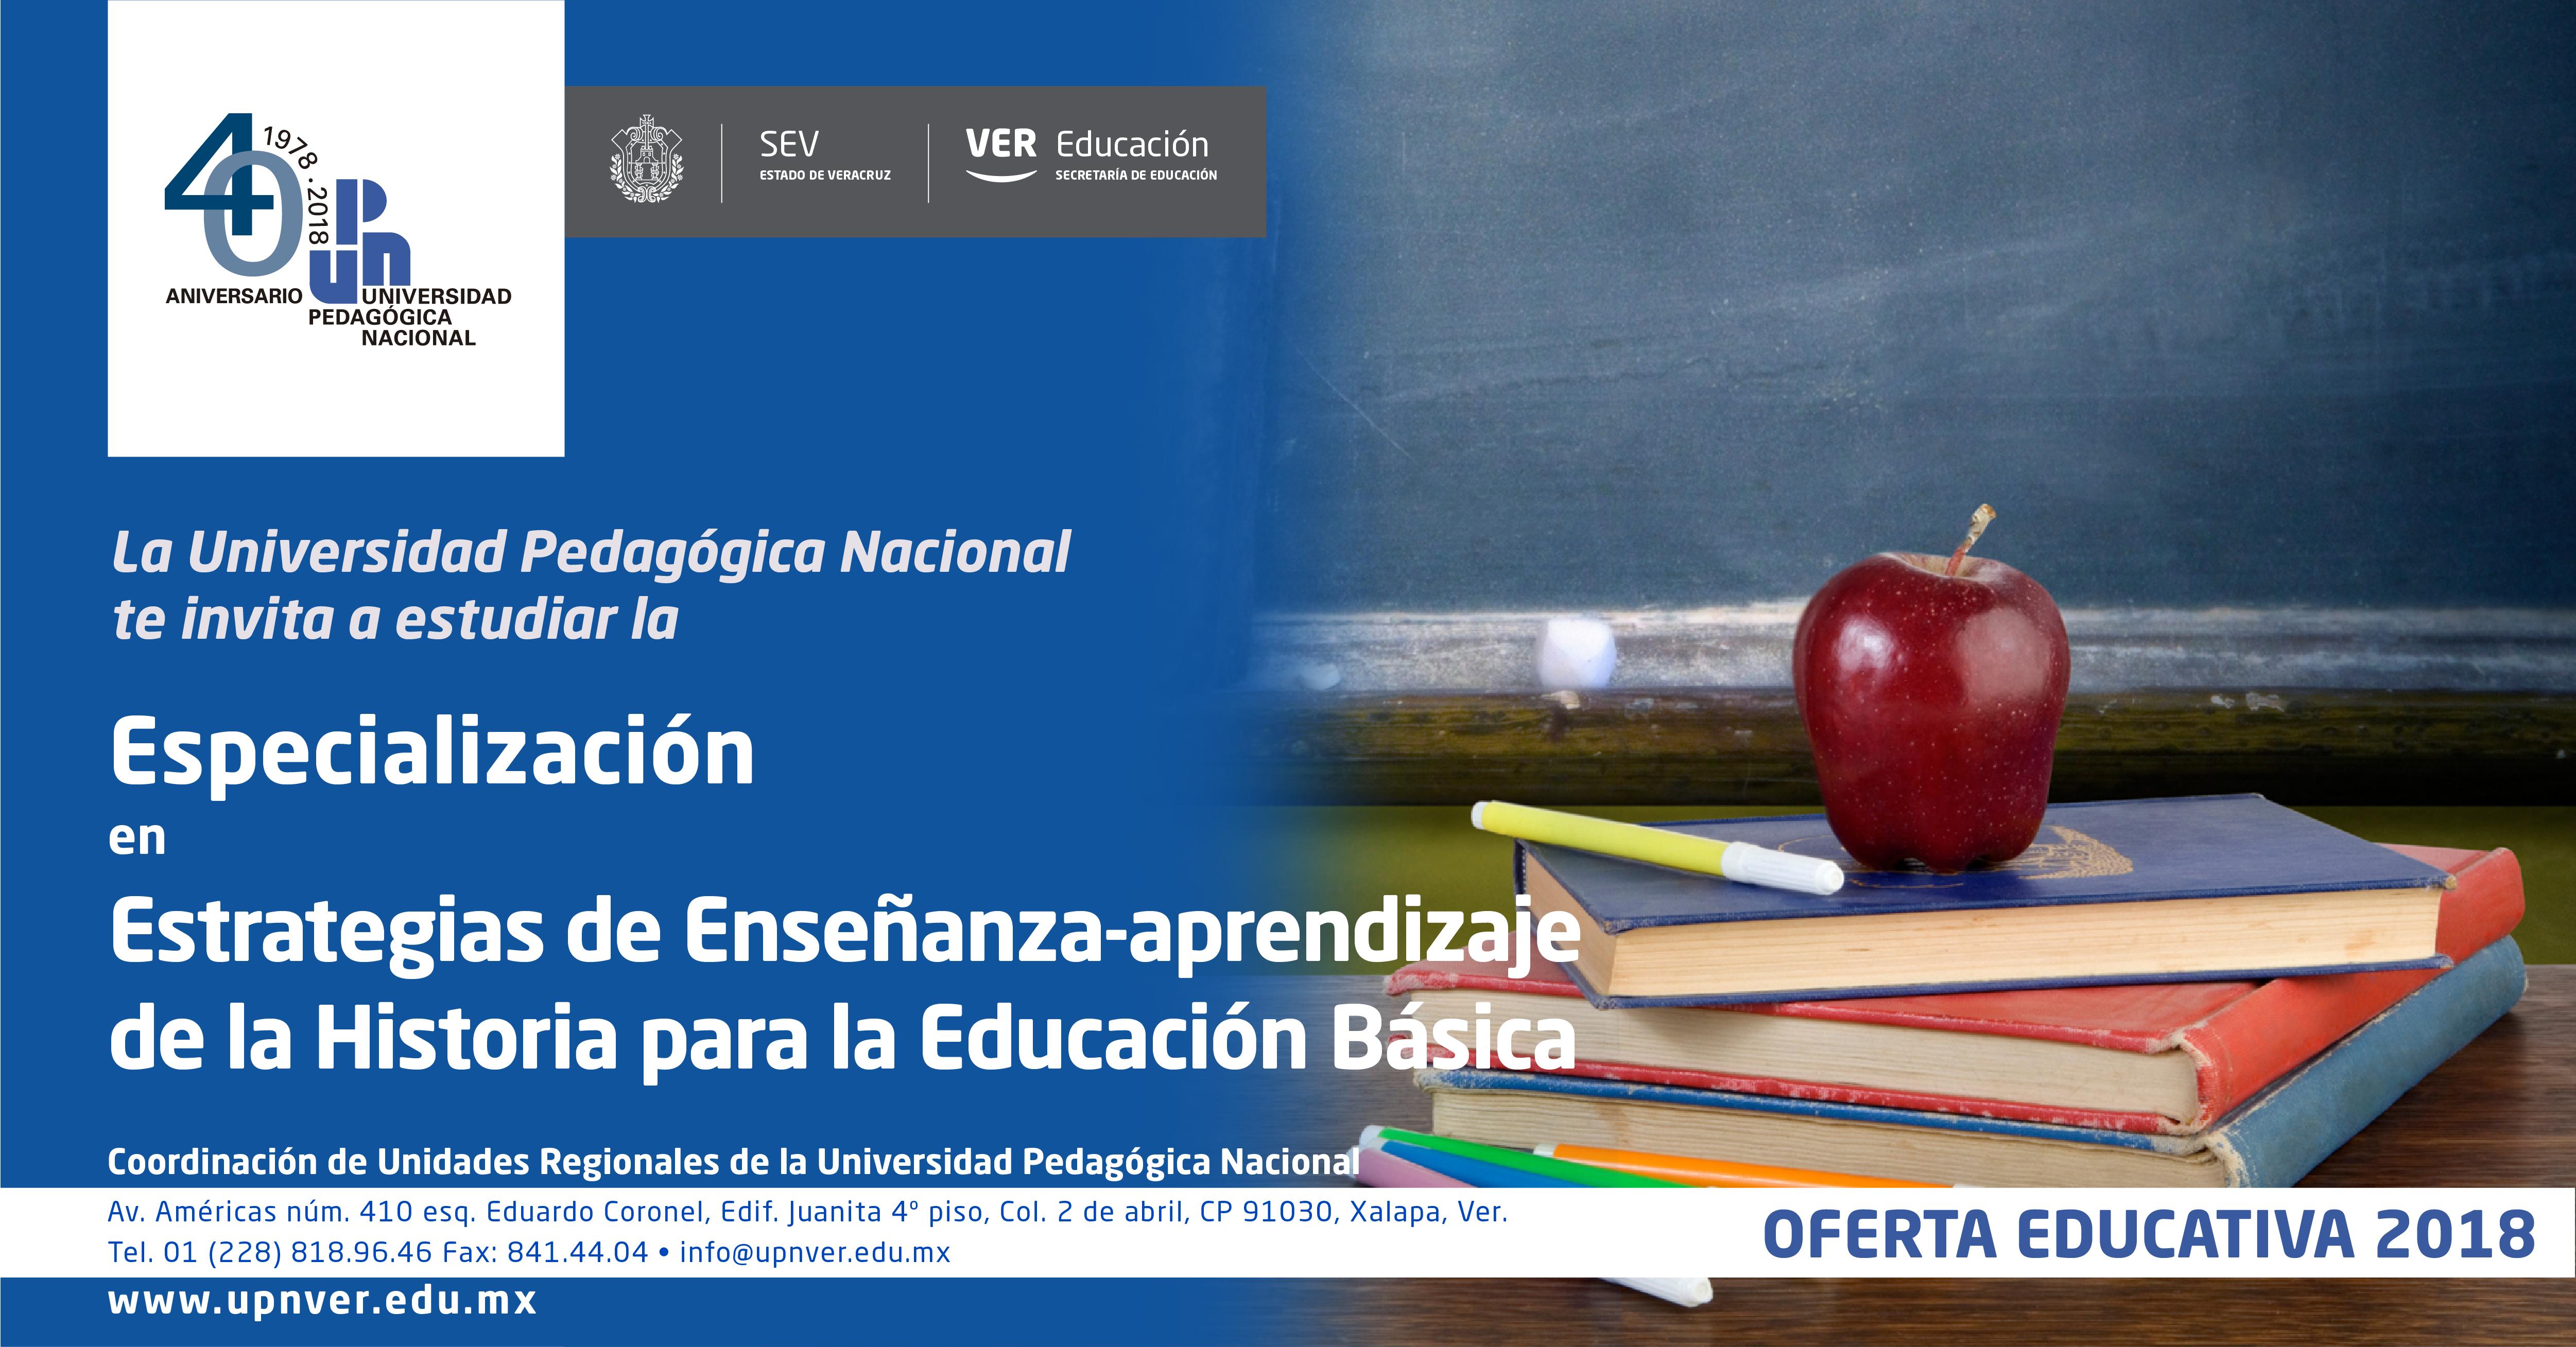 UPN_Banner_Promoción_Facebook_Historia_Educación_Básica